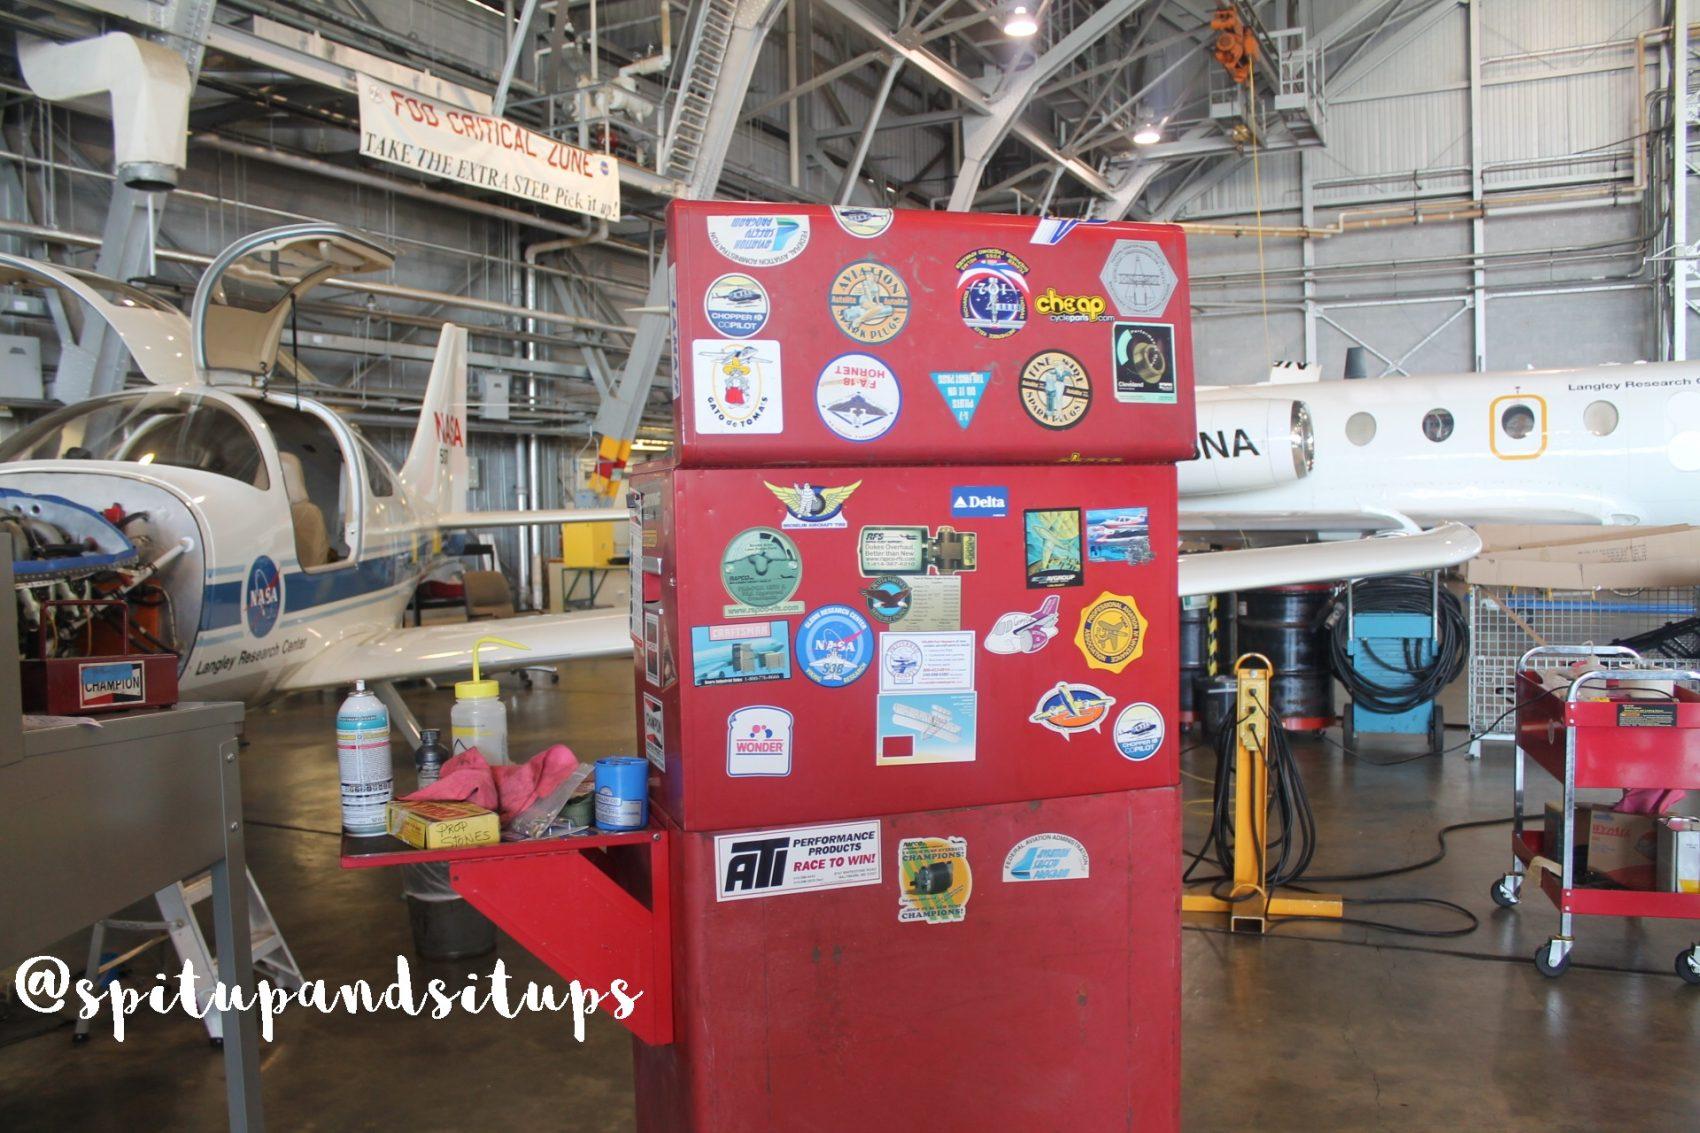 Langley Research Center Hangar 6